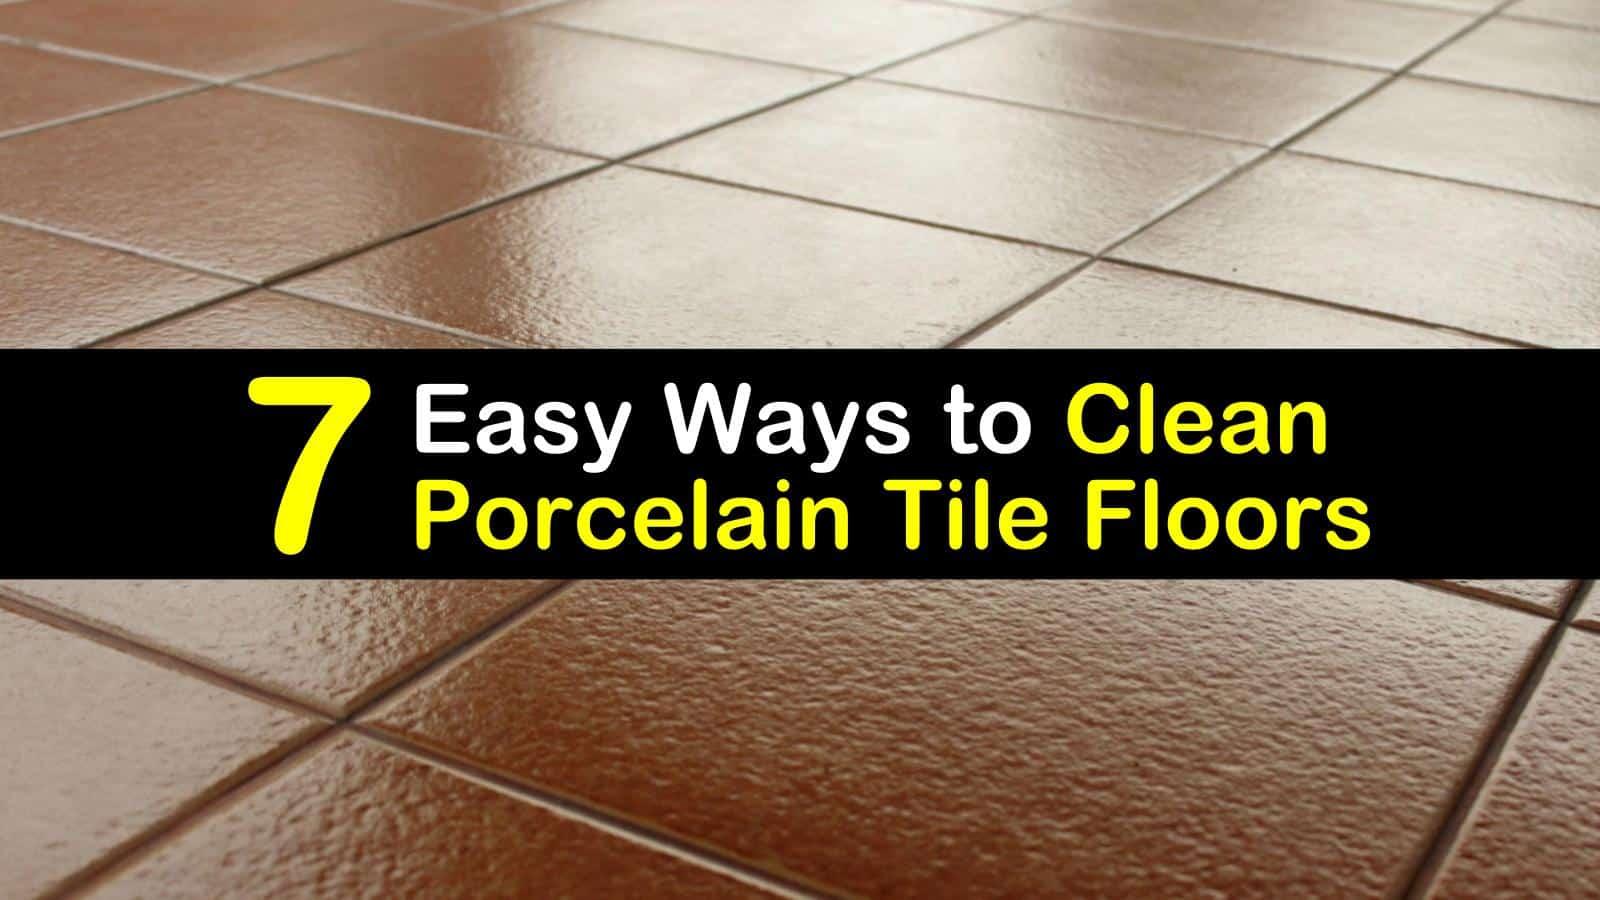 7 easy ways to clean porcelain tile floors